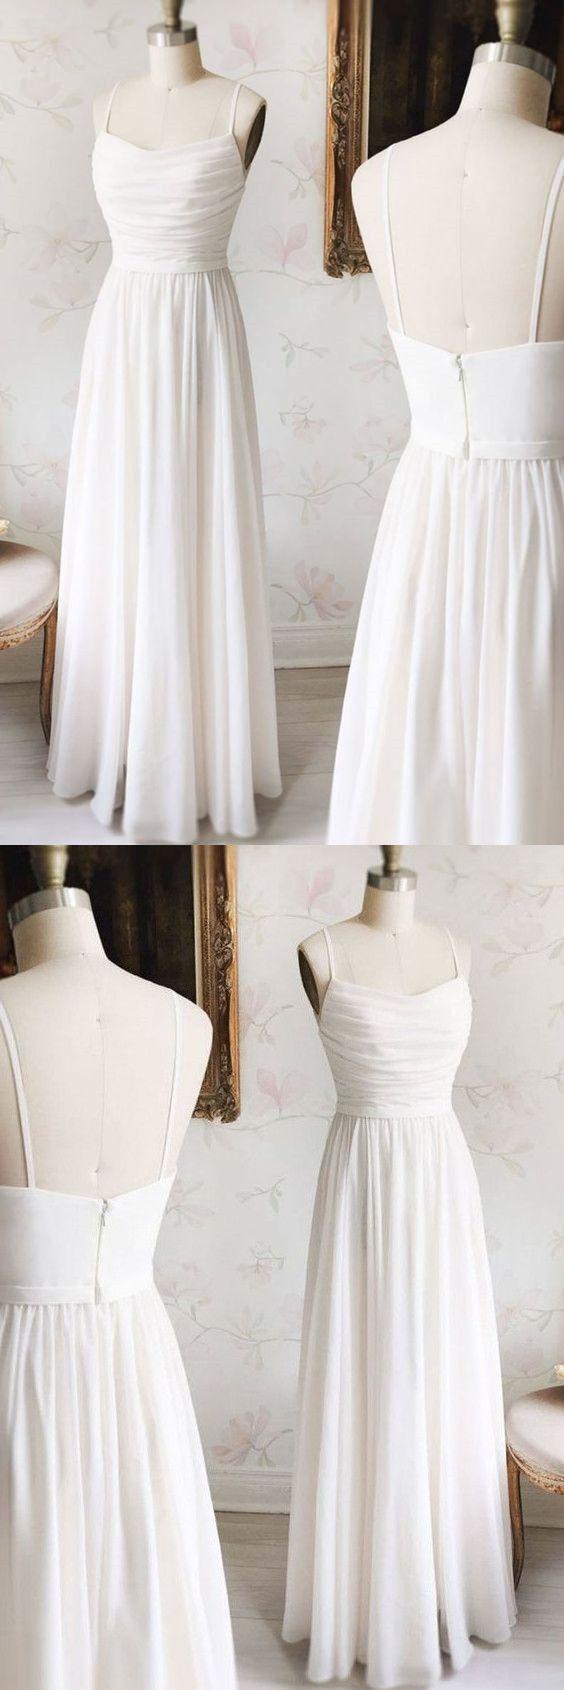 Simple white long chiffon prom dressspaghetti straps evening dress